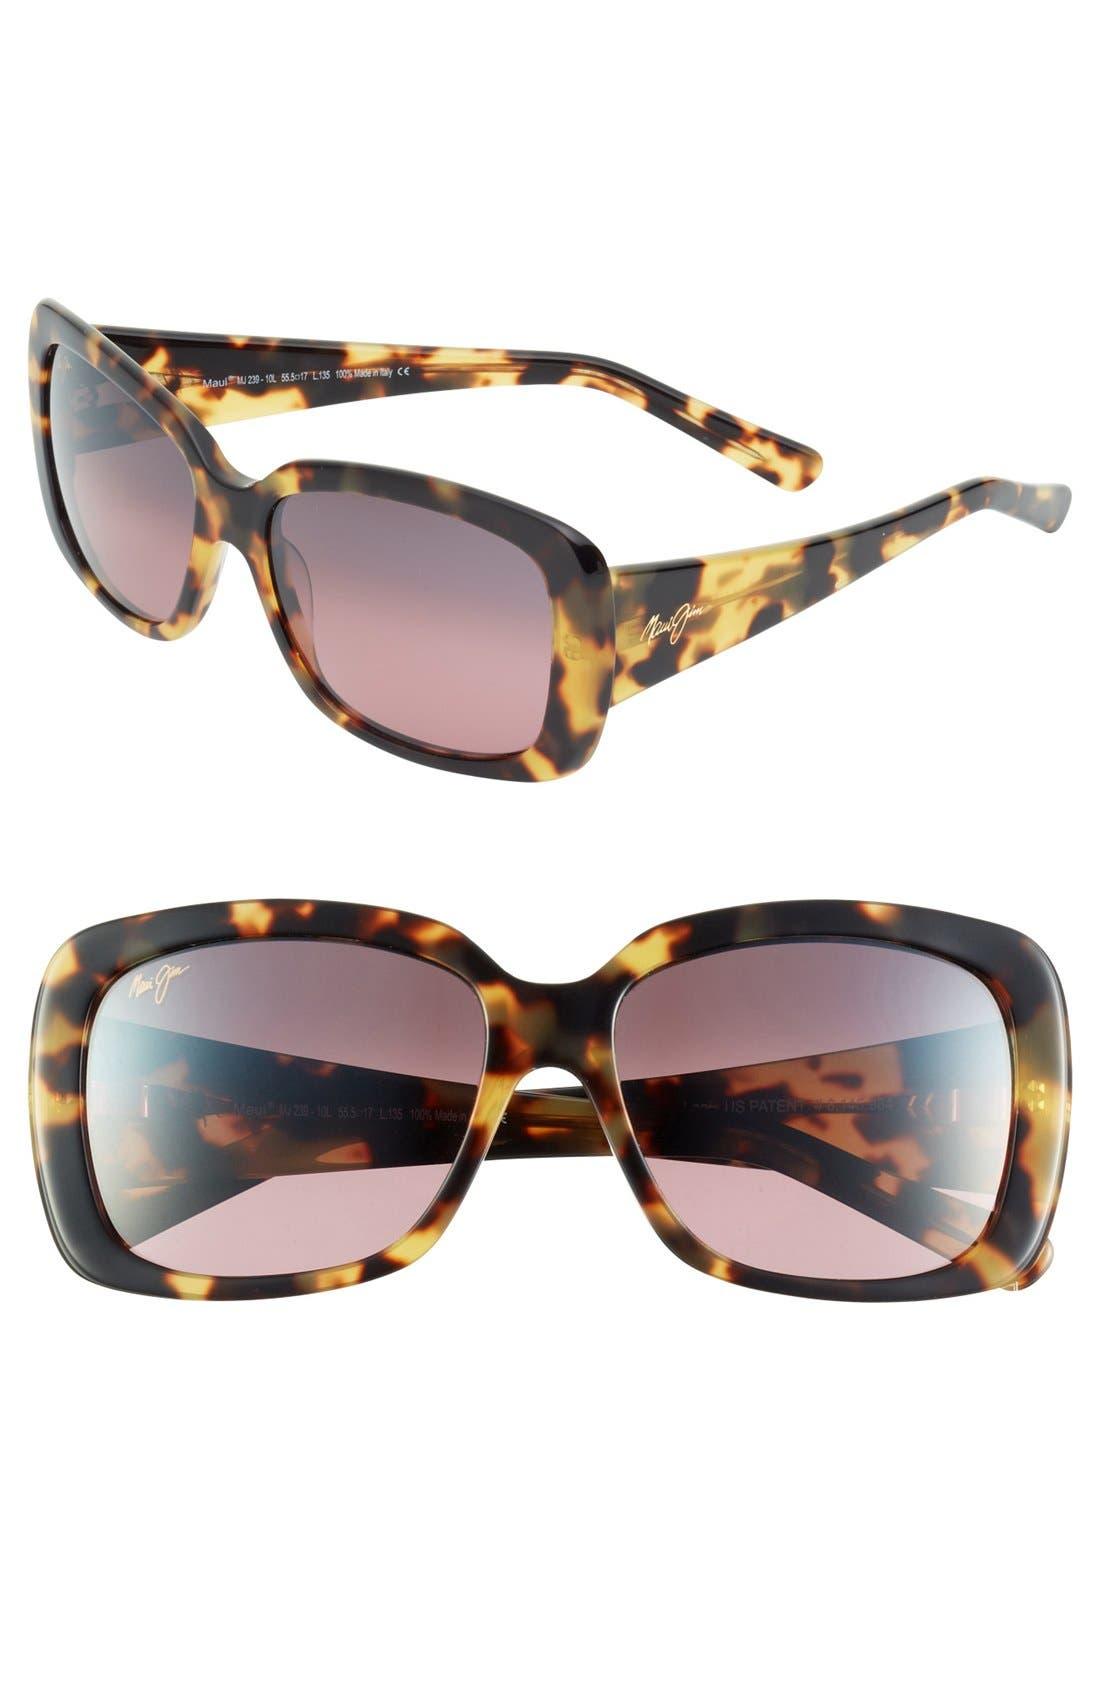 Alternate Image 1 Selected - Maui Jim 'Lilikoi' 56mm Sunglasses